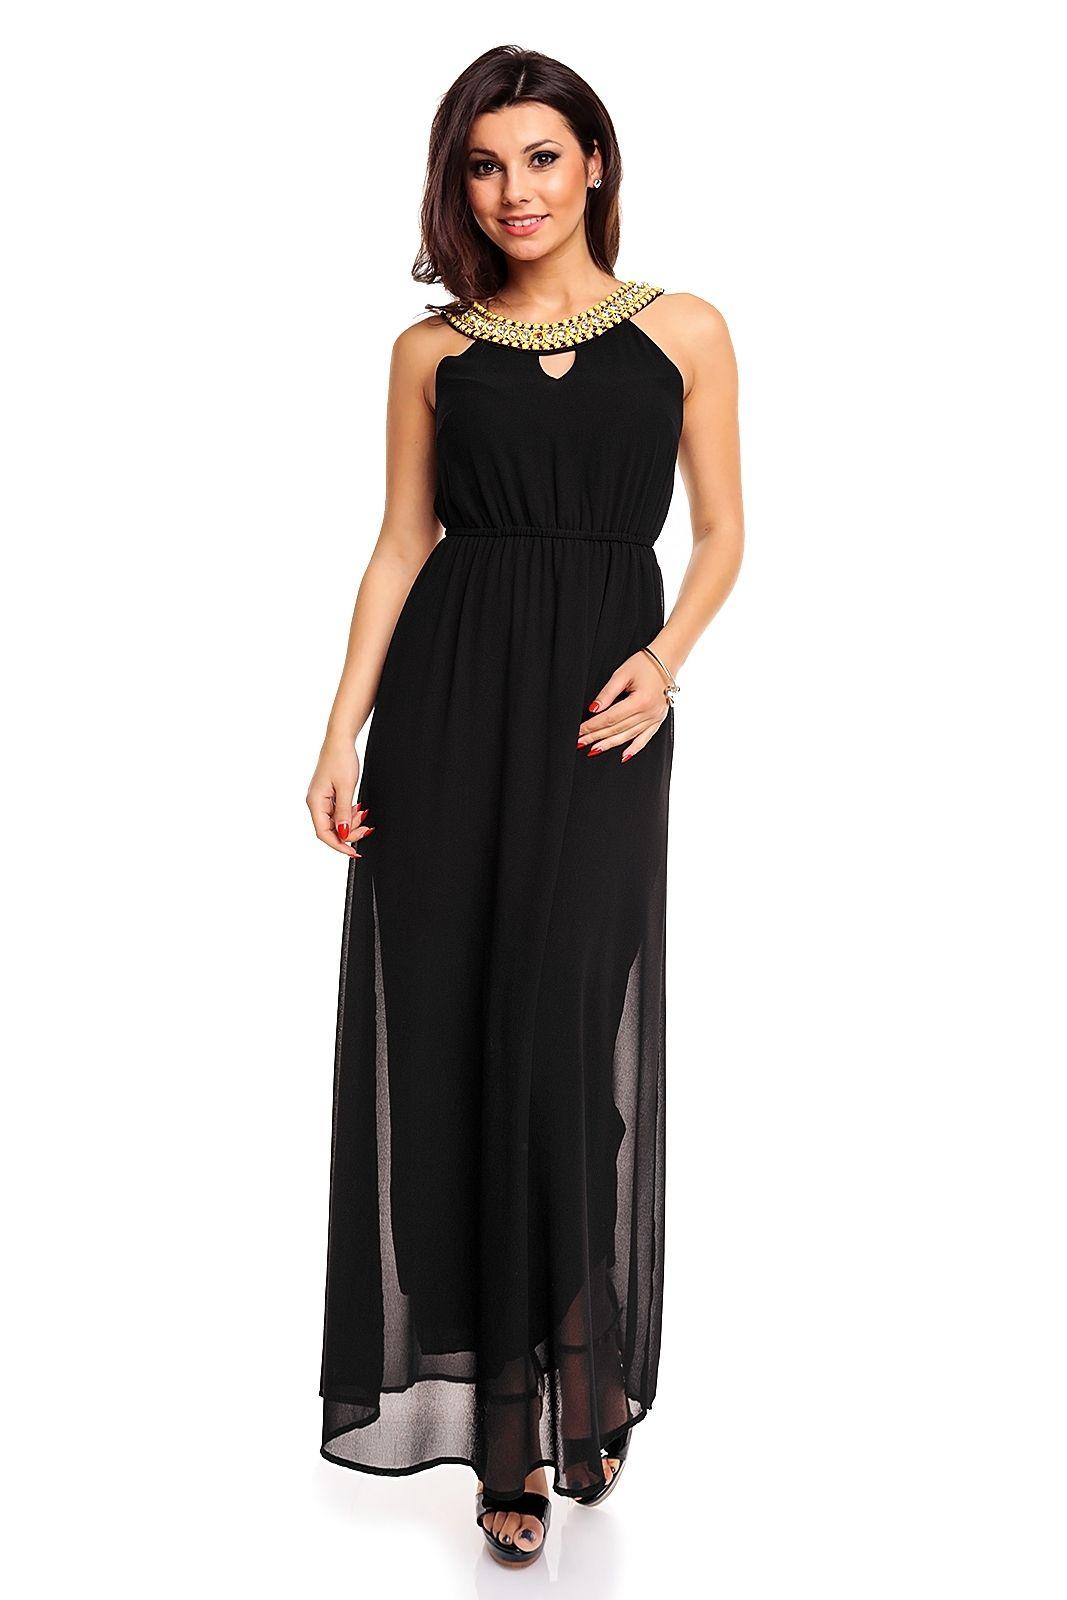 robe longue de soir e chic et tendance robe de soir e noire tm fe019 toufamode gnader. Black Bedroom Furniture Sets. Home Design Ideas